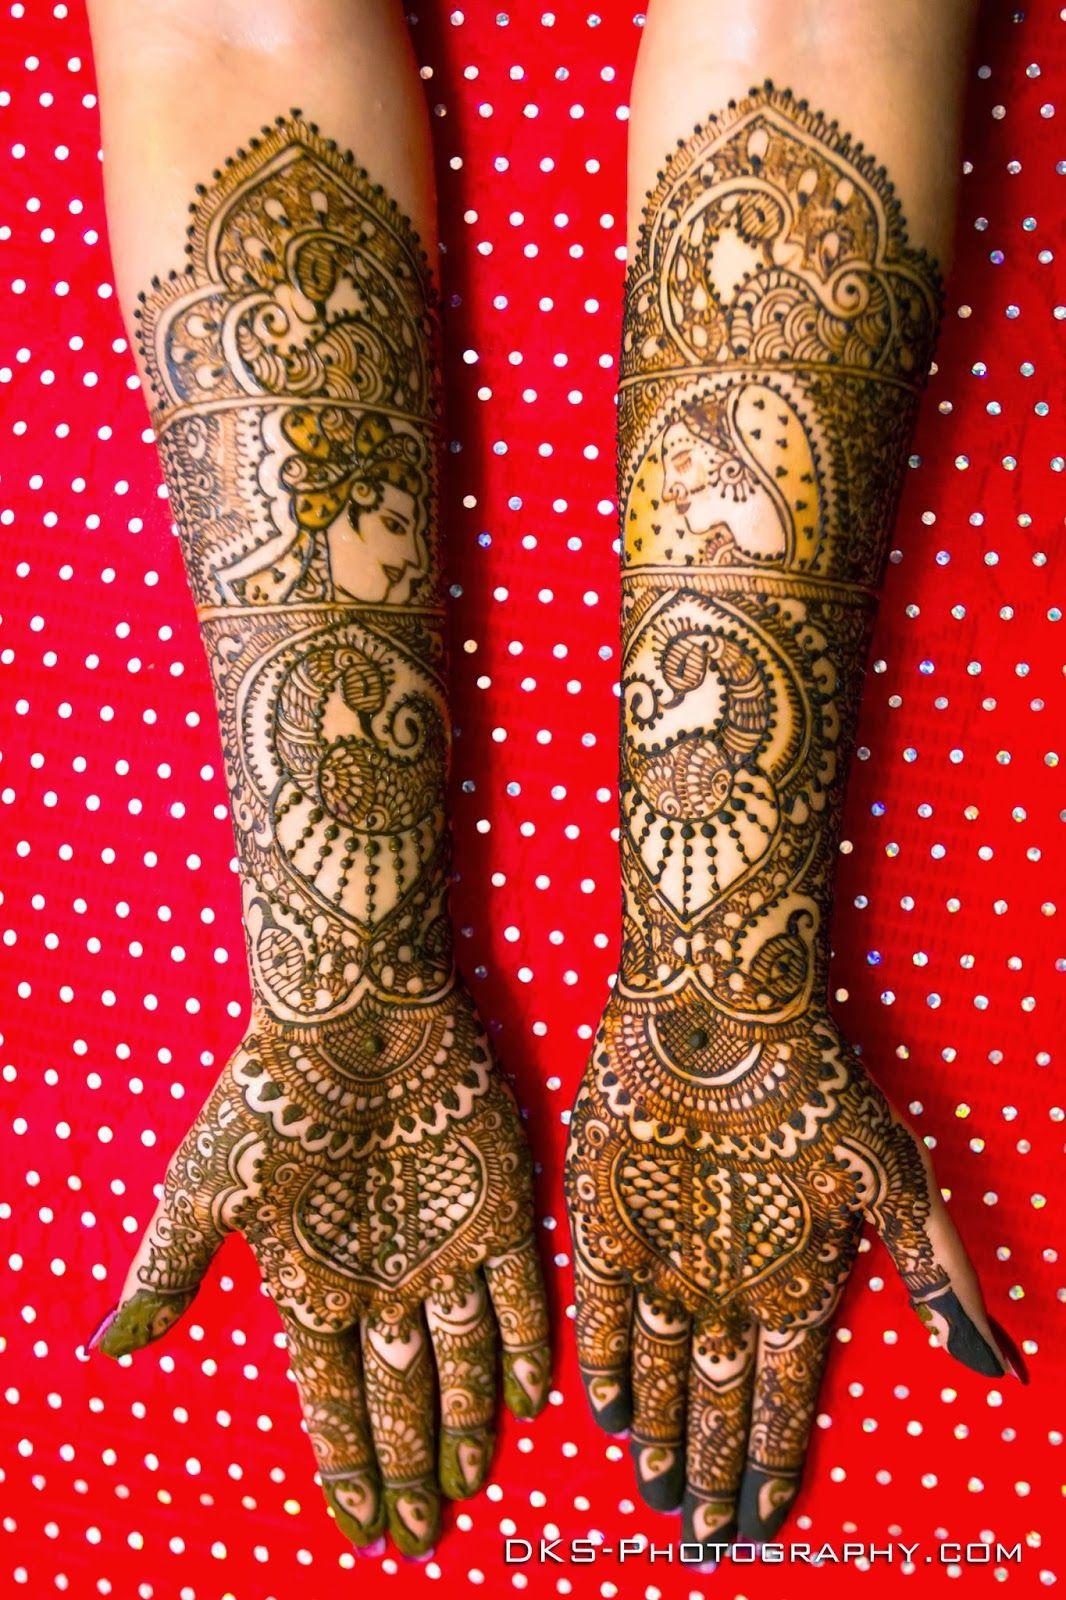 Bridal mehndi 2013 - Latest Eid Top Mehndi Design For Women 2013 14 By Neeta Sharmaoctober 13 2013